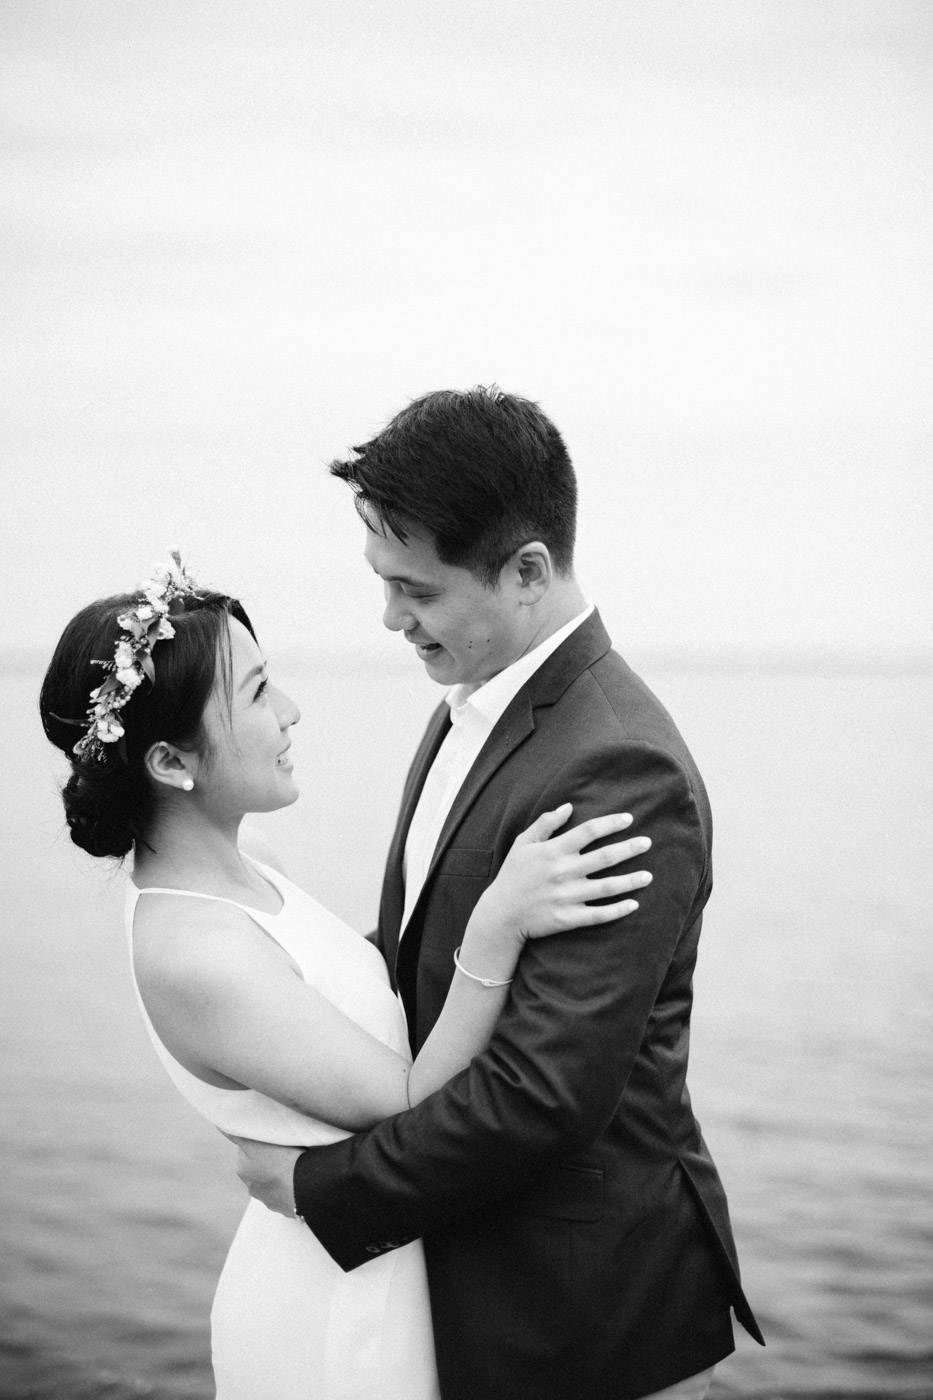 toronto_wedding_photographer_fine_art_documentary 2017-181.jpg